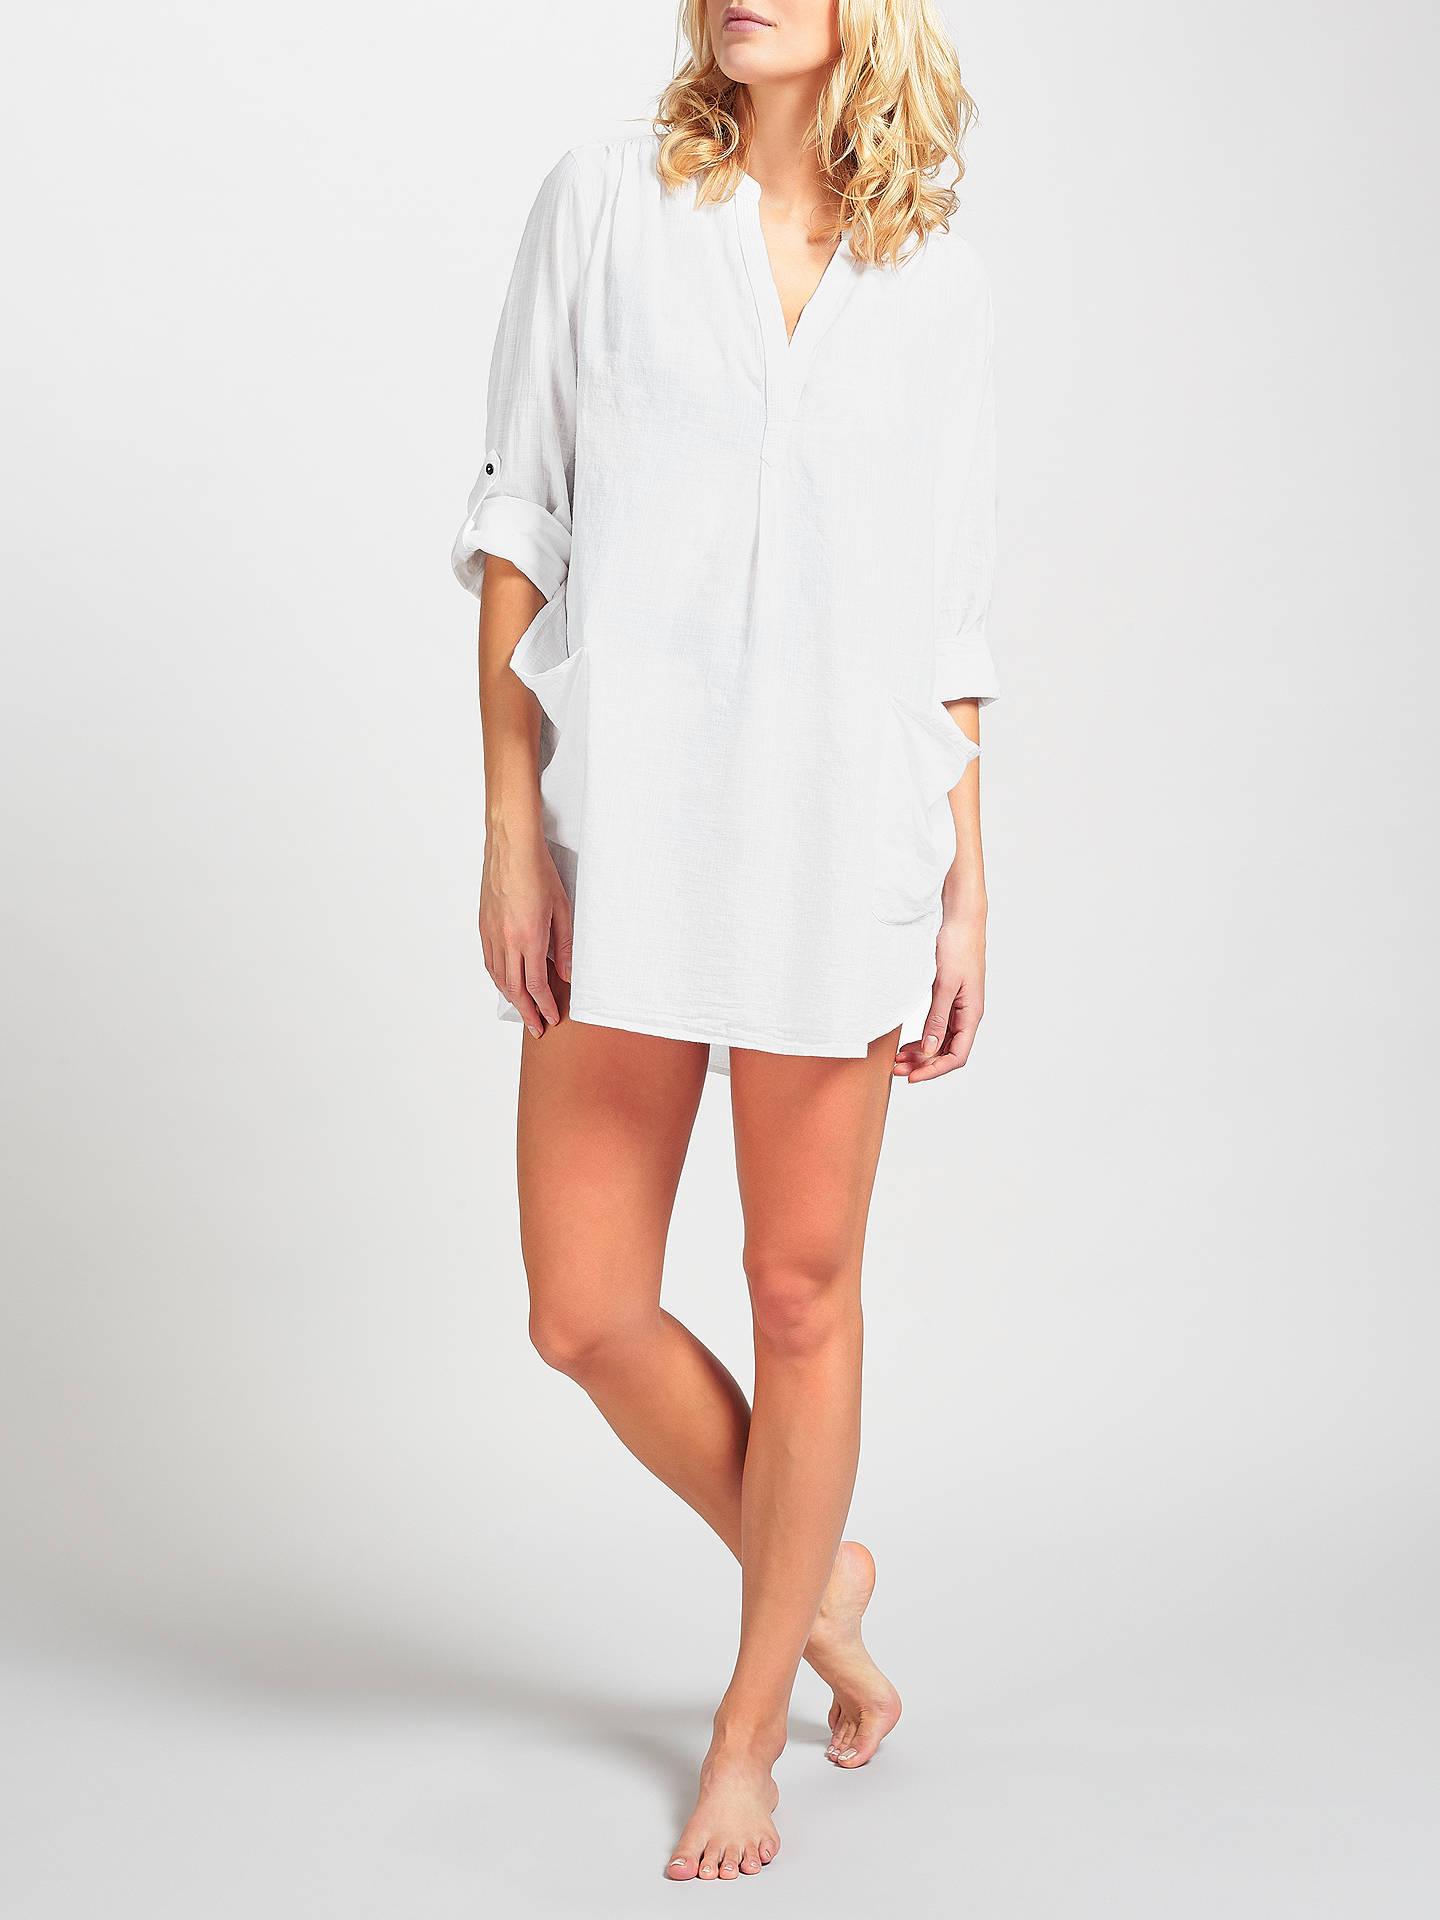 f4926435a8 Buy Seafolly Boyfriend Beach Shirt, White, S Online at johnlewis.com ...